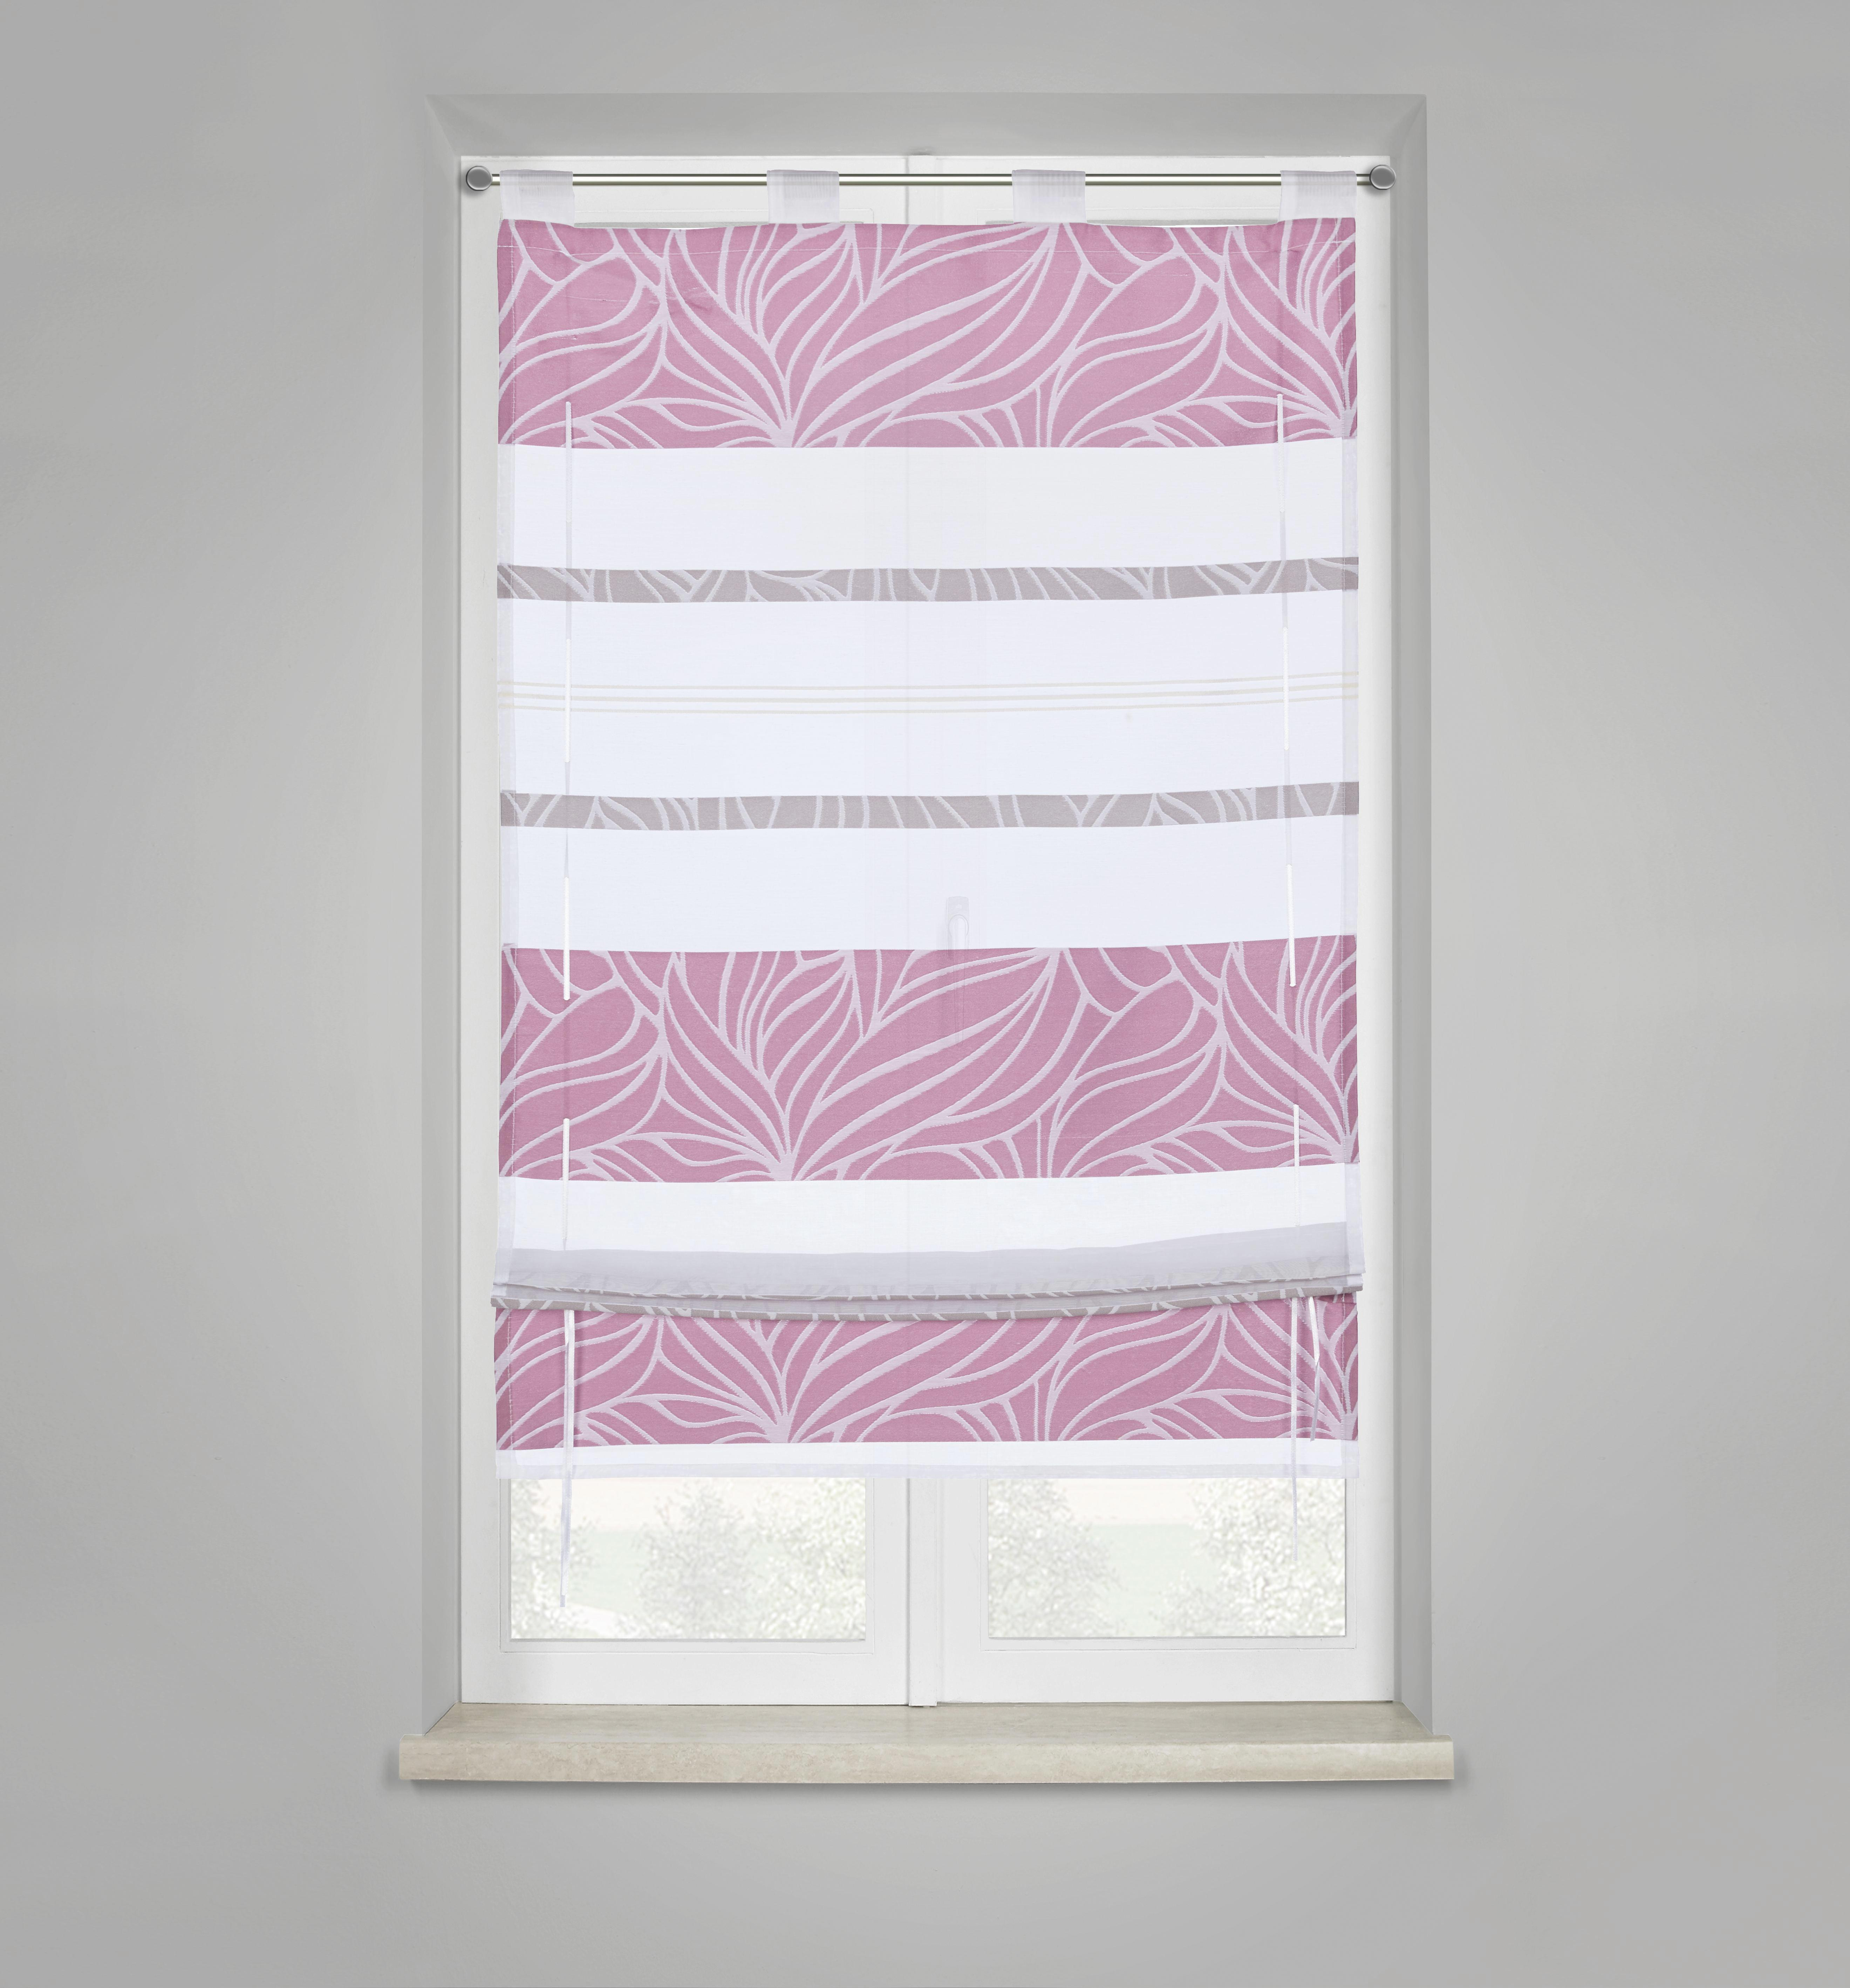 Bändchenrollo Anita, ca. 60x140cm - Lila, KONVENTIONELL, Textil (60/140cm) - MÖMAX modern living